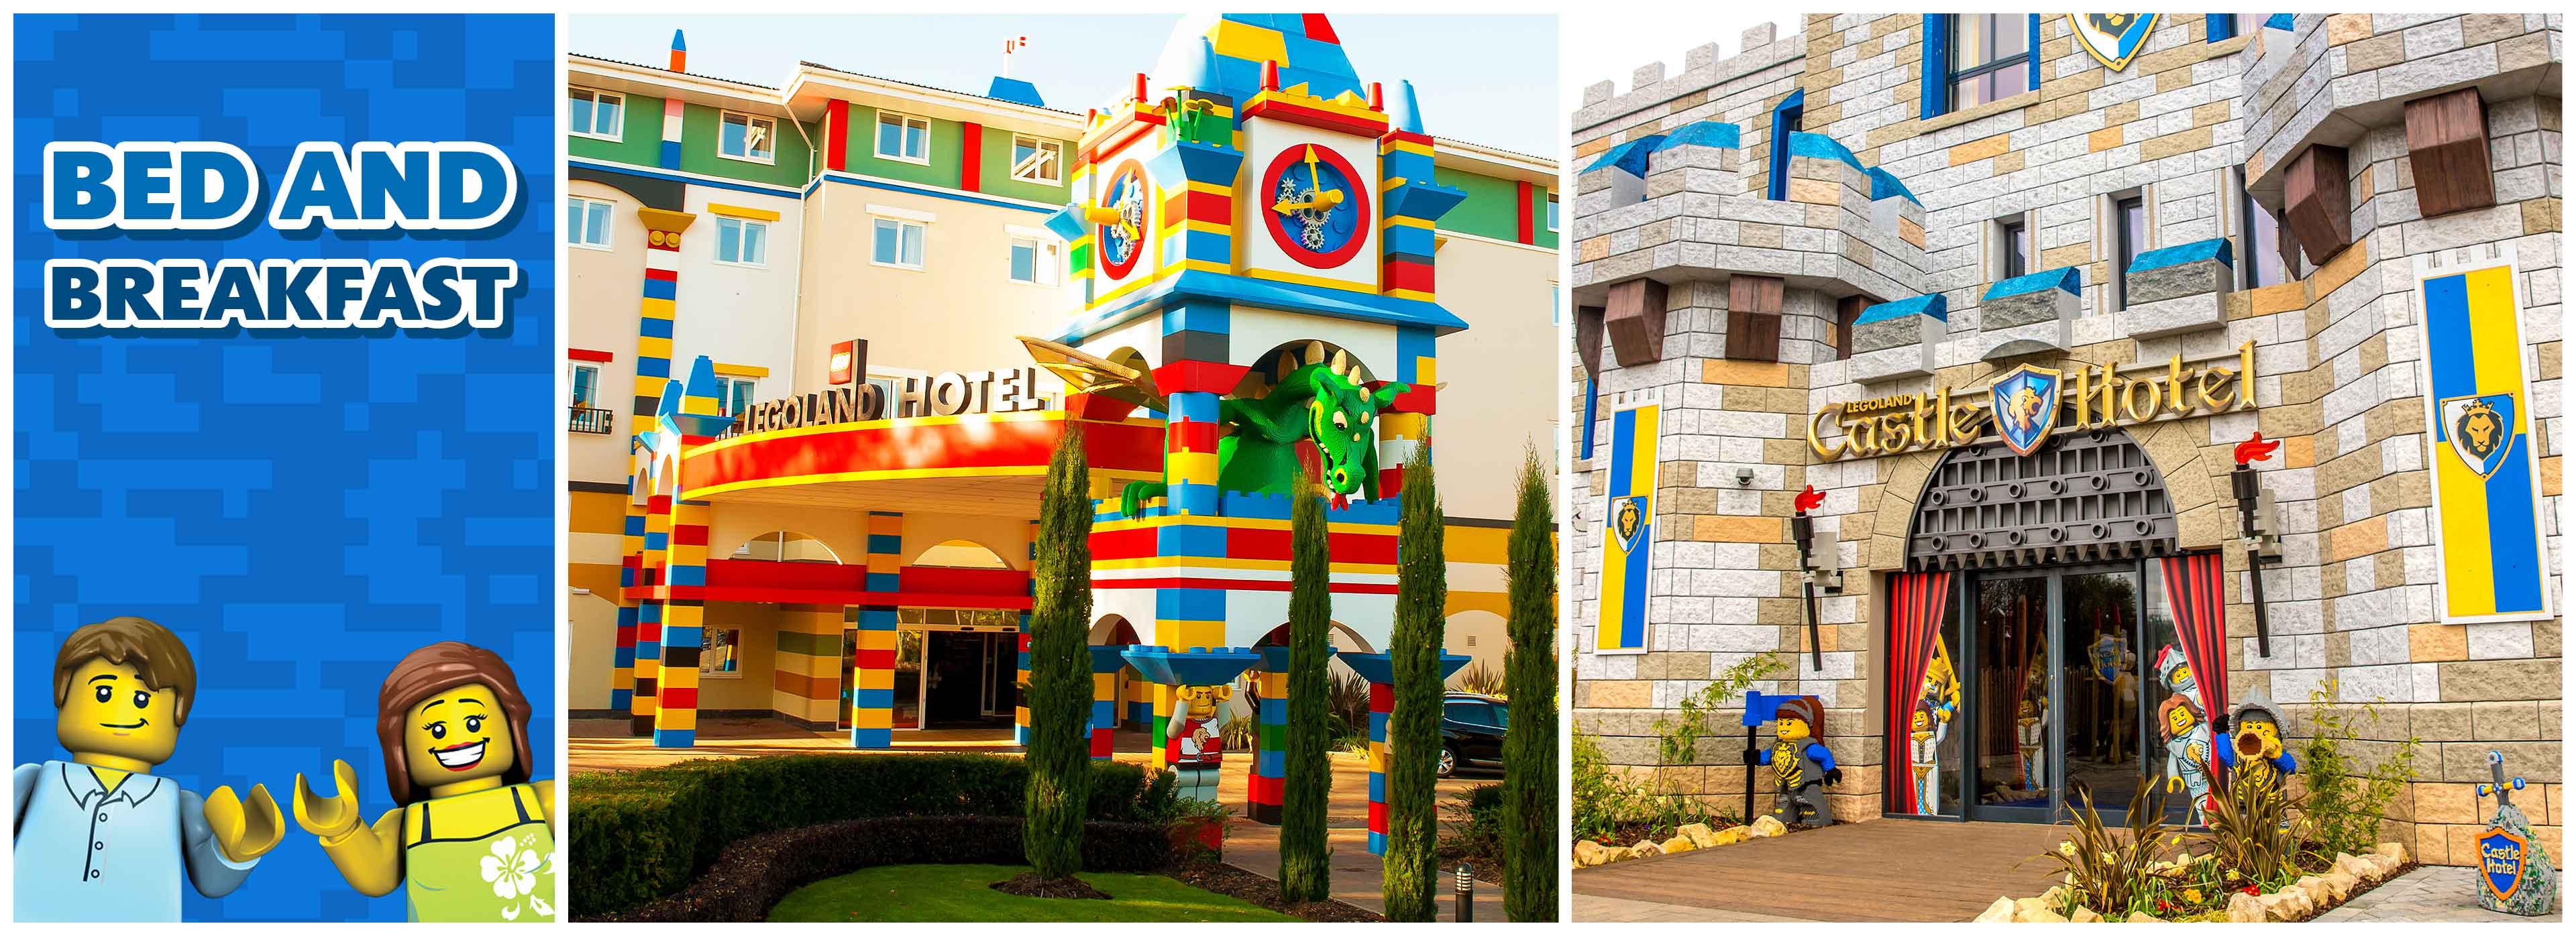 LEGOLAND Resort Hotel bed and breakfast